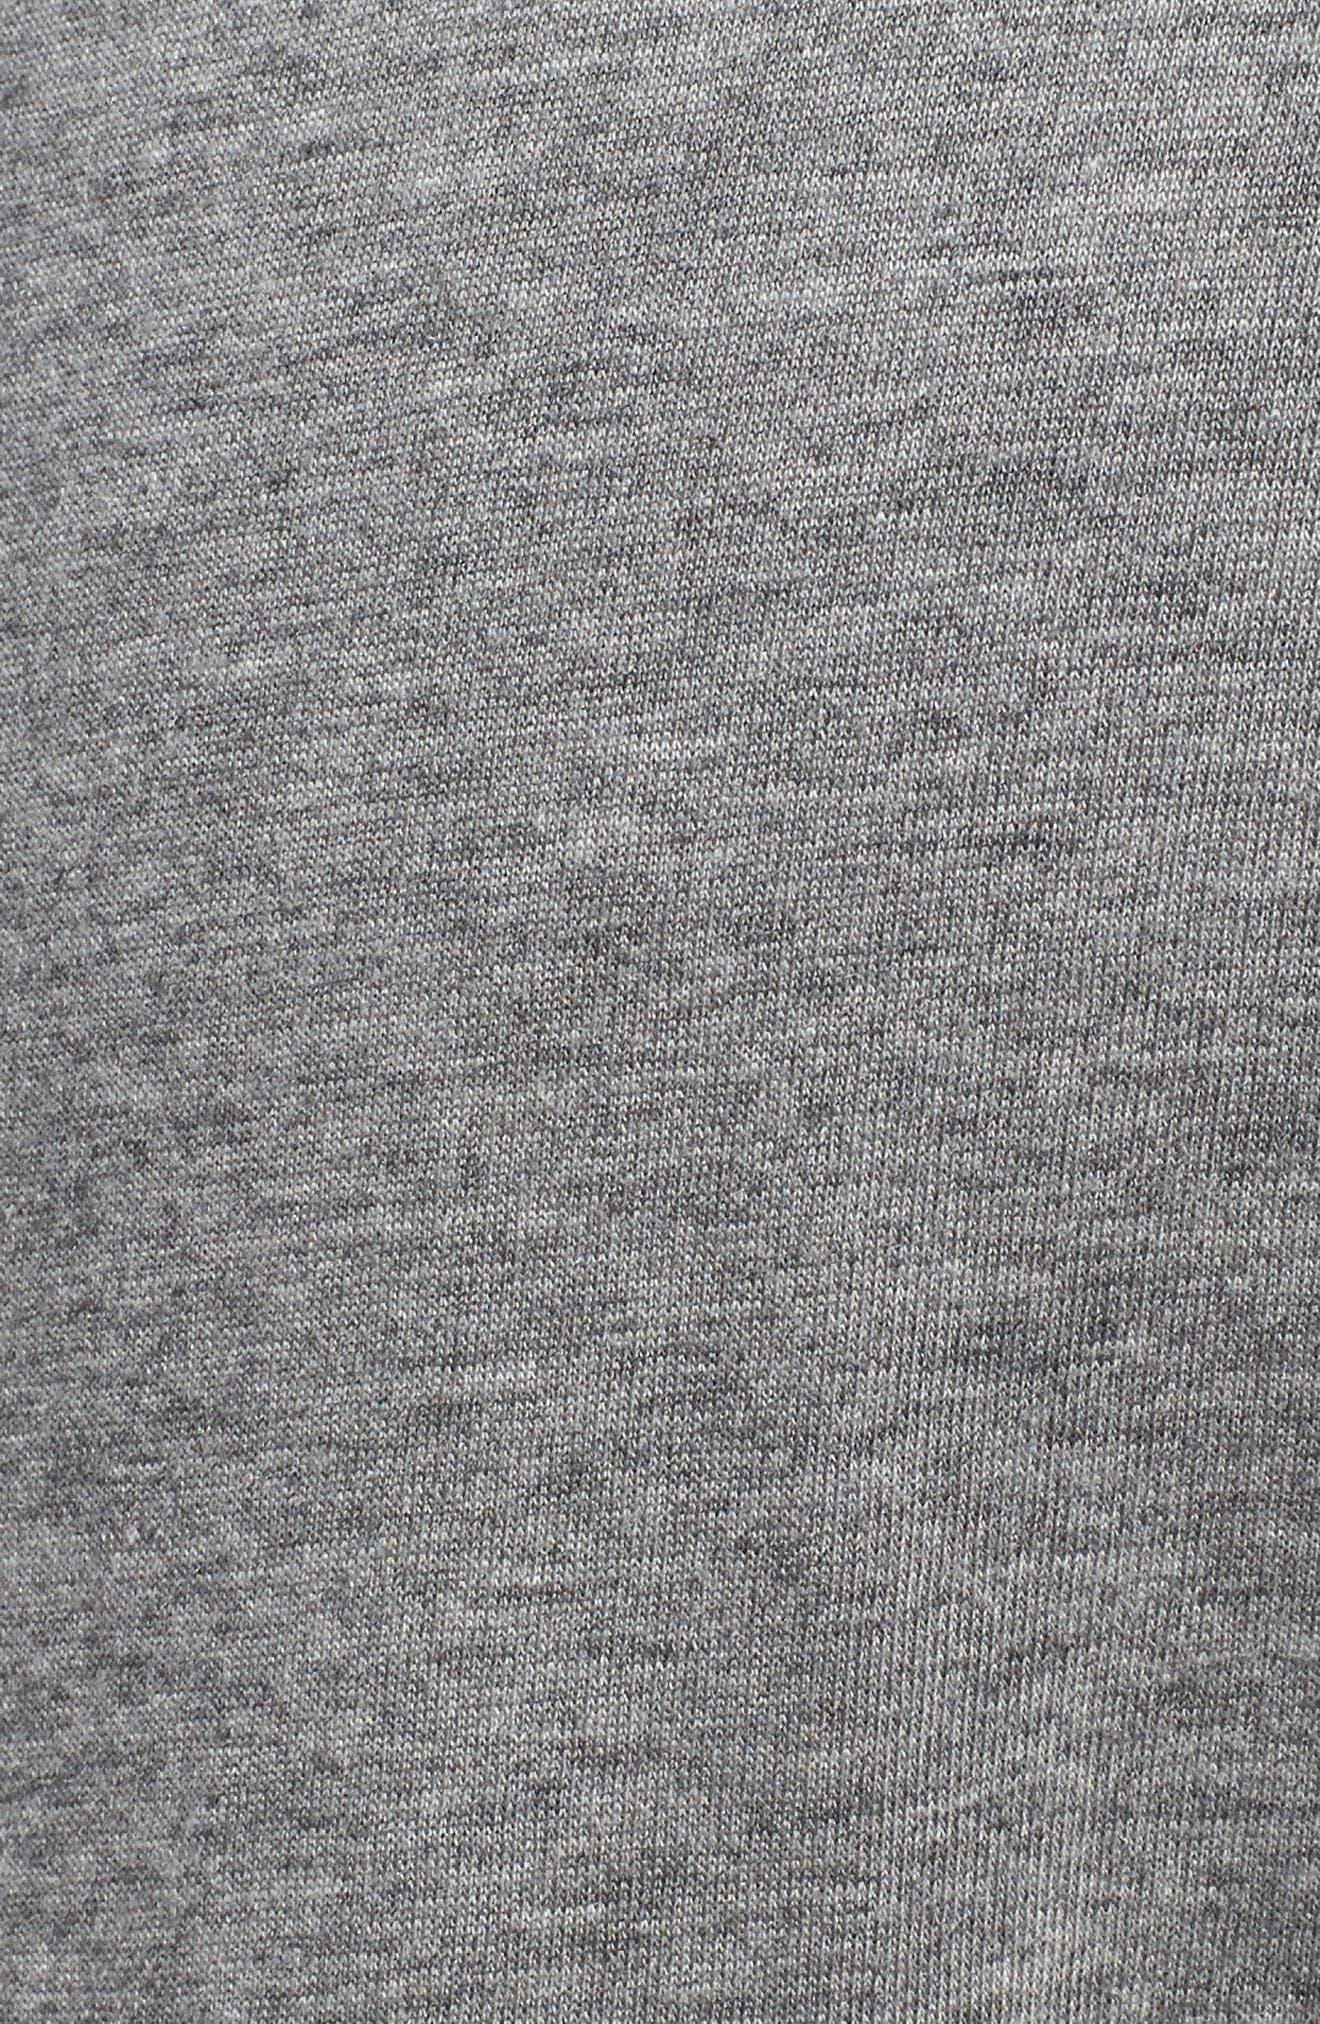 Pima Cotton & Modal Lounge Pants,                             Alternate thumbnail 5, color,                             Grey Heather